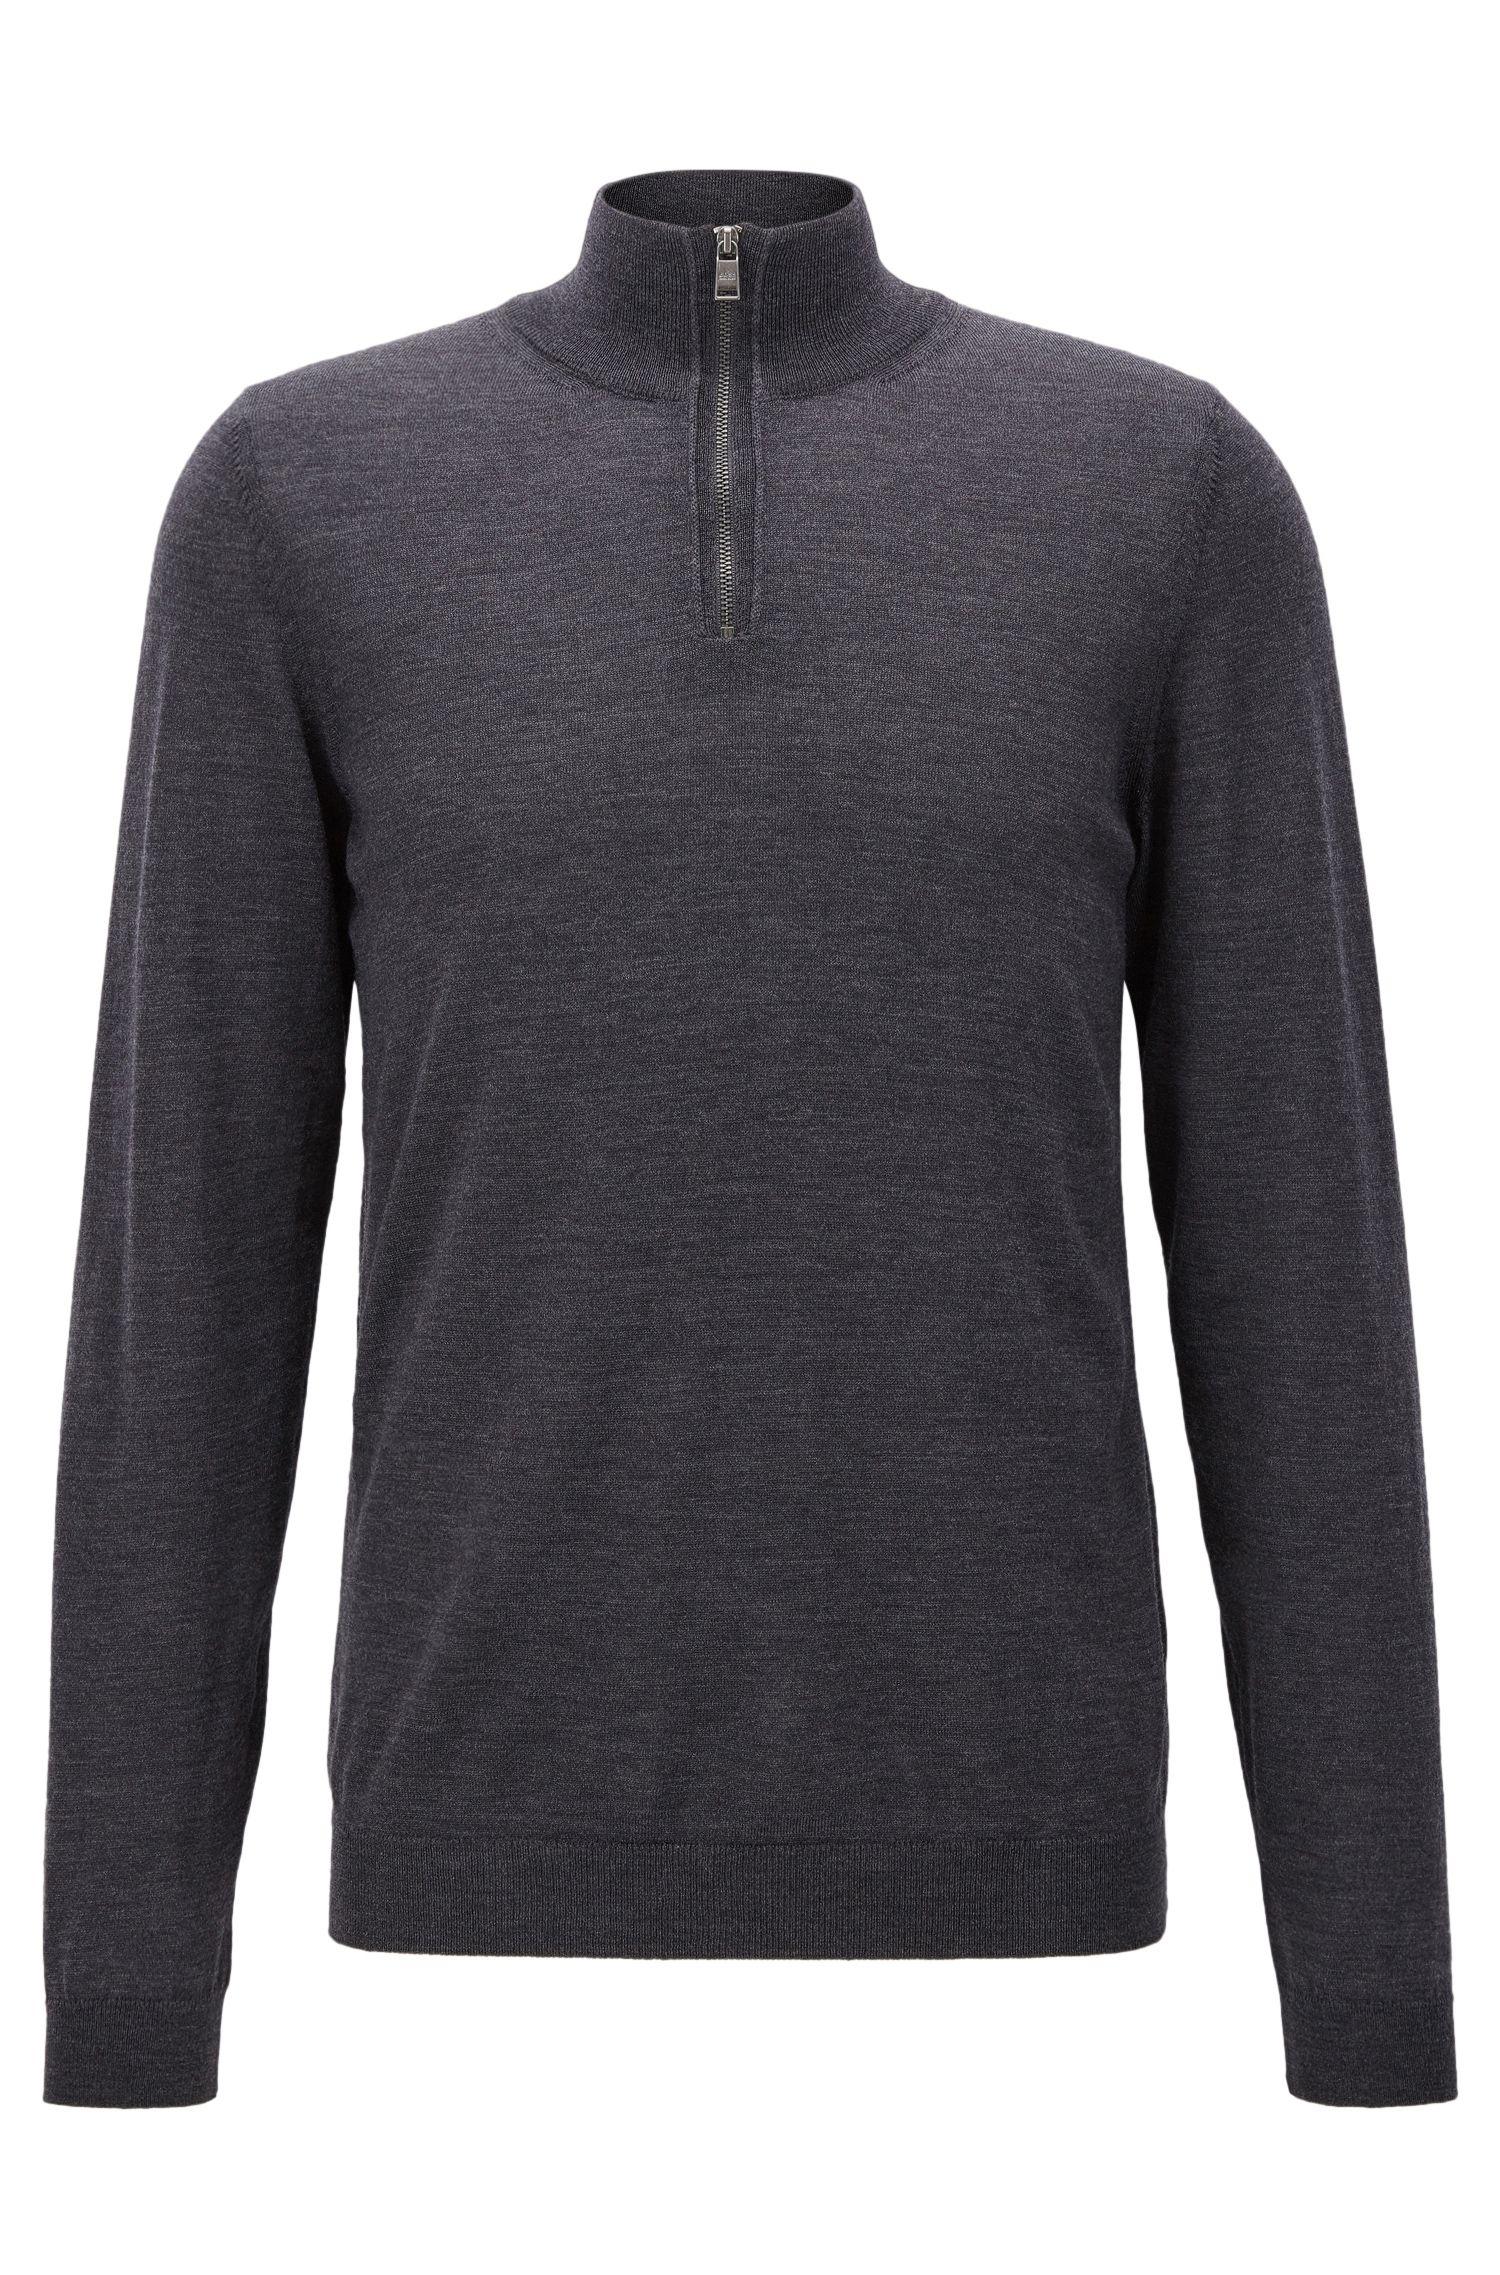 Slim-fit zip-neck sweater in merino wool